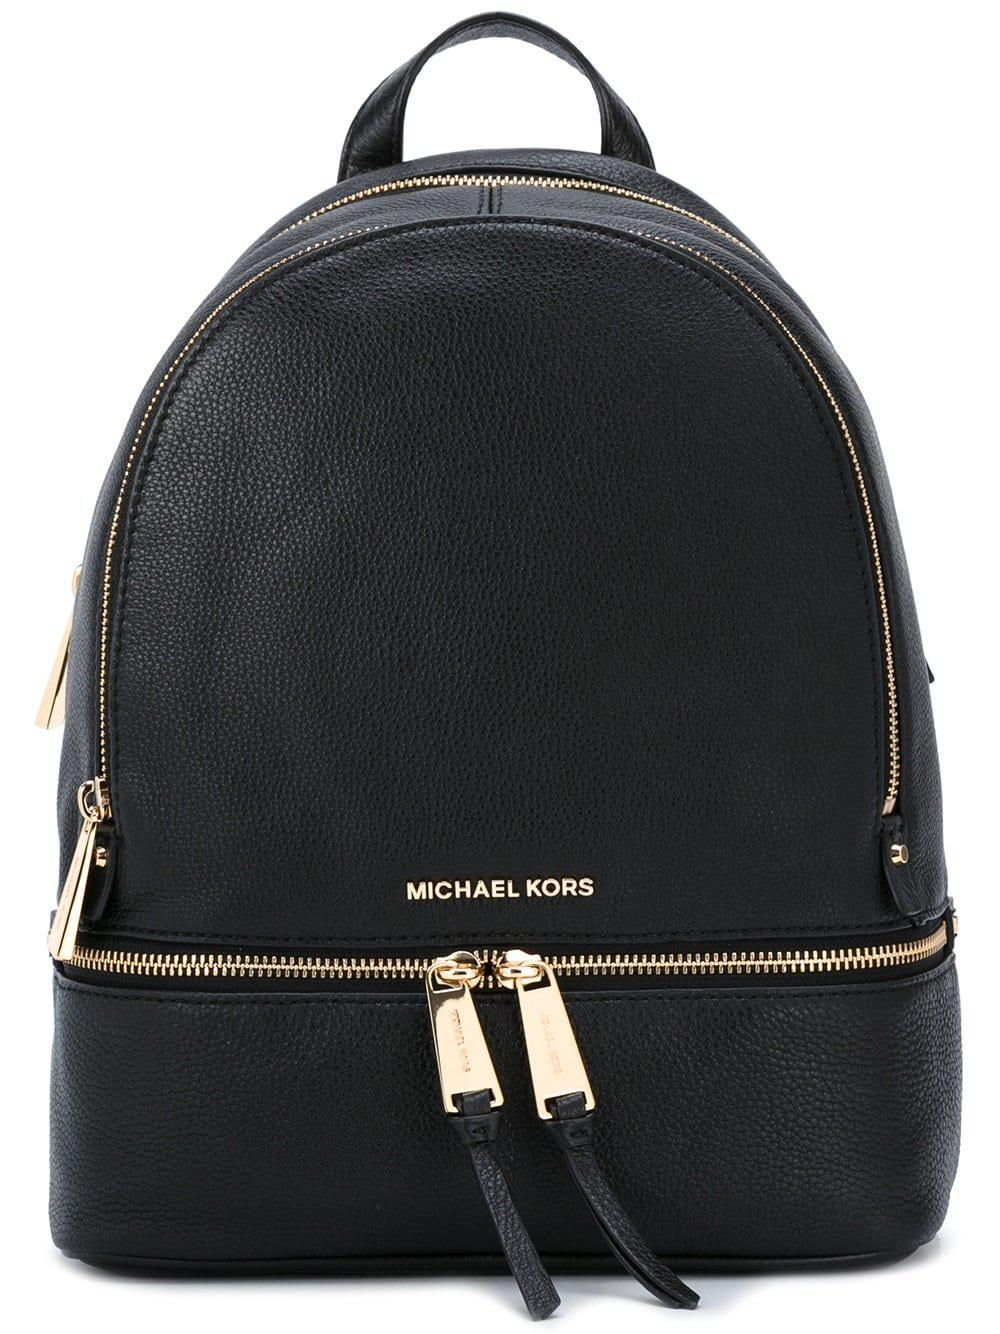 604b406eda1c Lyst - MICHAEL Michael Kors Rhea Zip Leather Backpack in Black ...